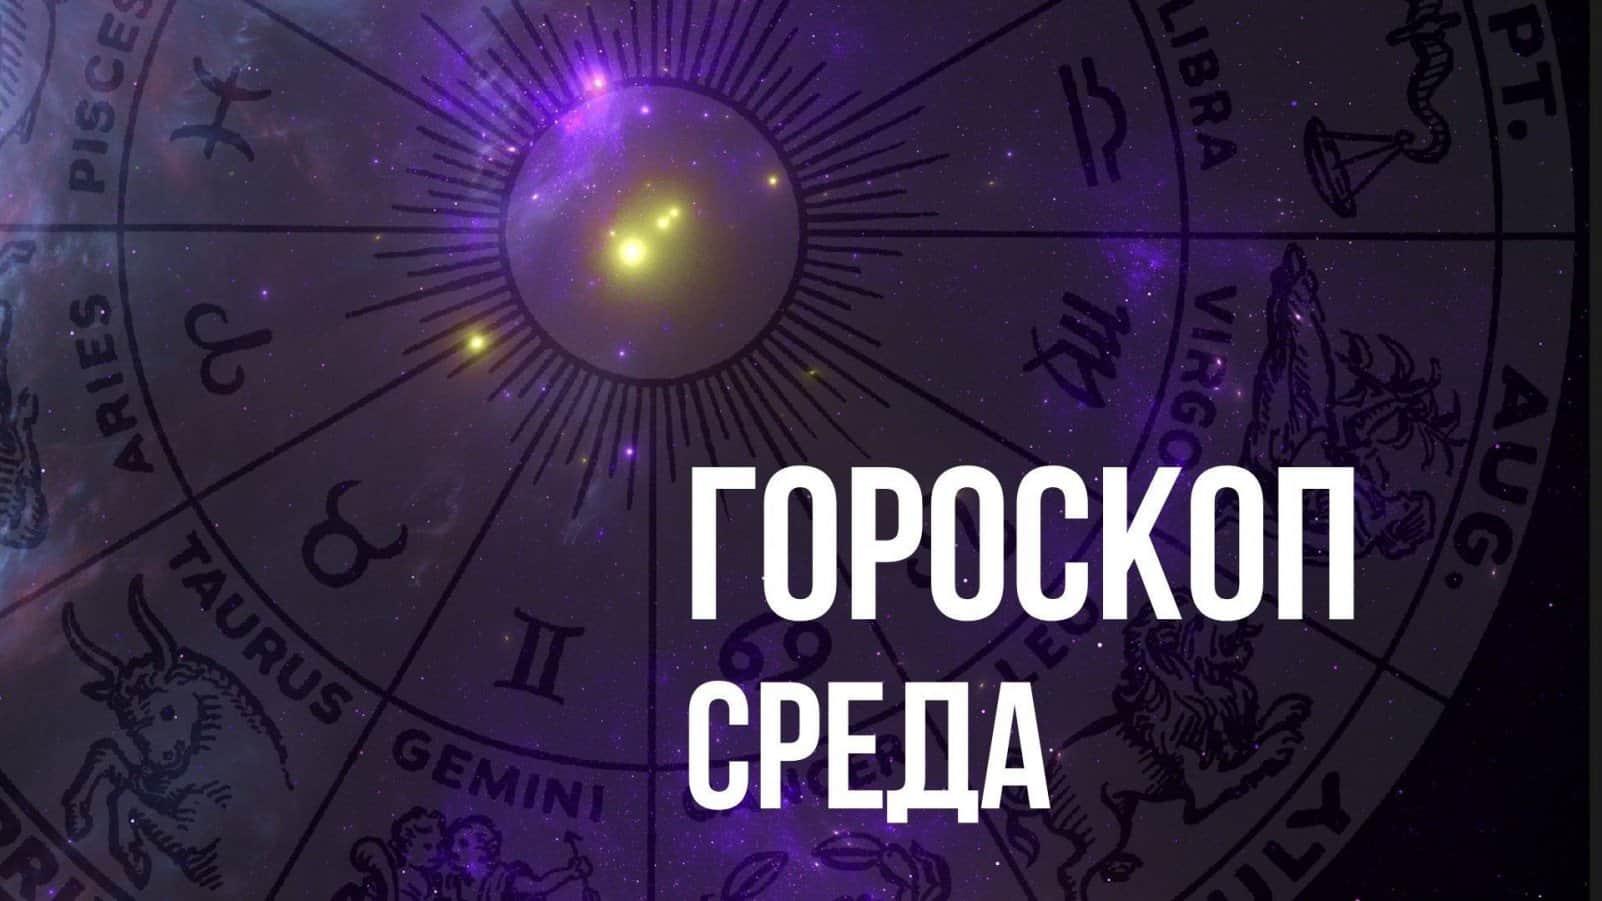 Гороскоп на среду 2 июня для каждого знака Зодиака